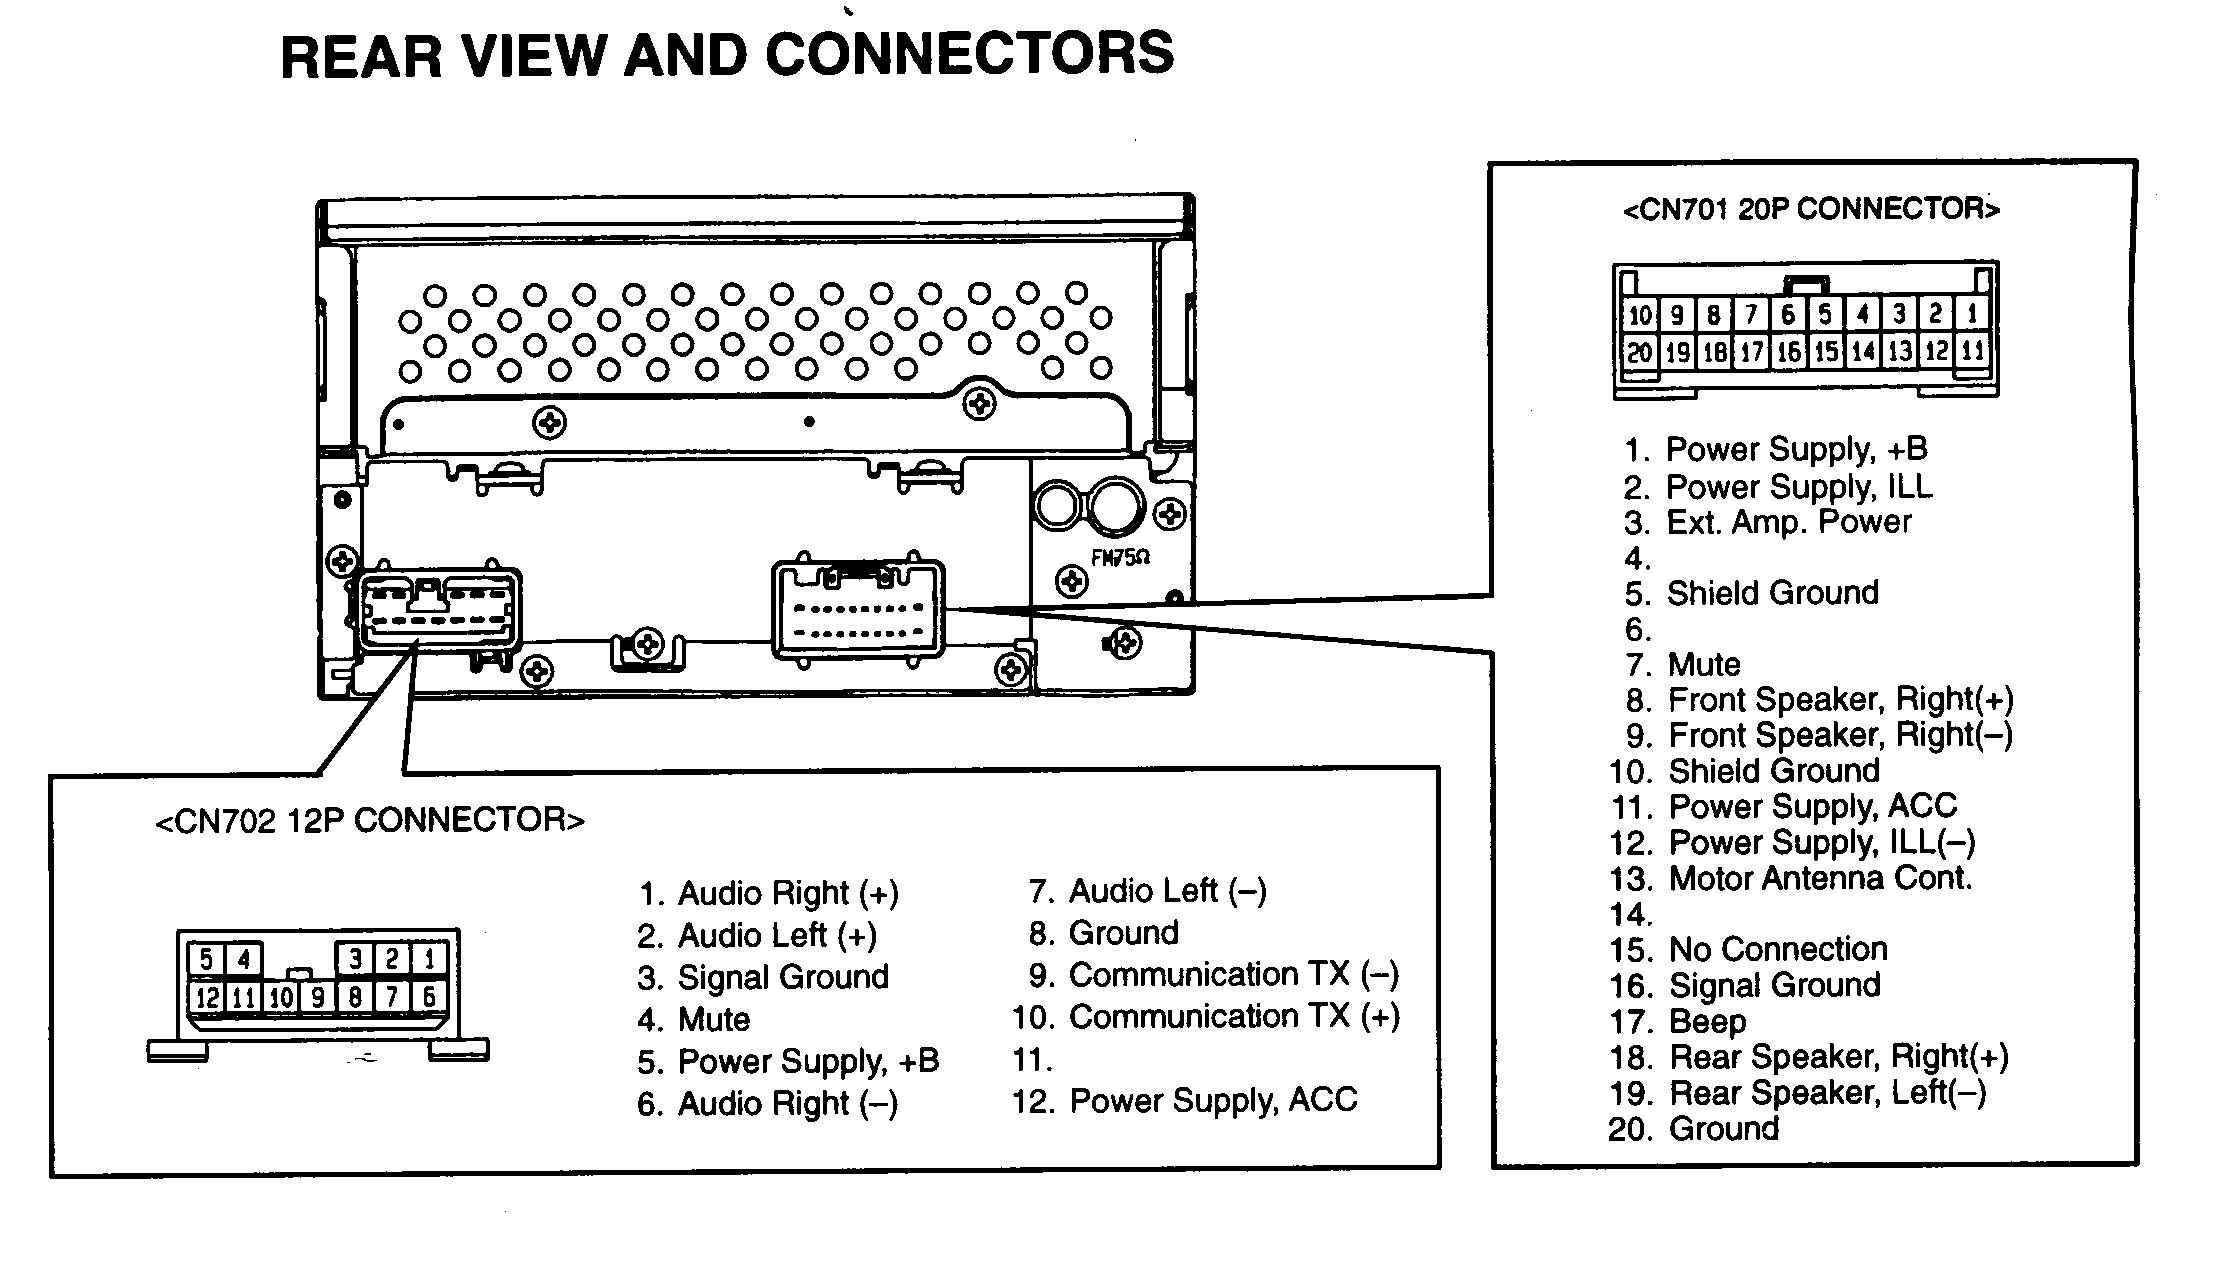 Hyundai car stereo wiring diagram wiring diagram hyundai car stereo wiring diagram with factory car stereo wiring 2007 hyundai accent radio wiring diagram hyundai car stereo wiring diagram asfbconference2016 Images